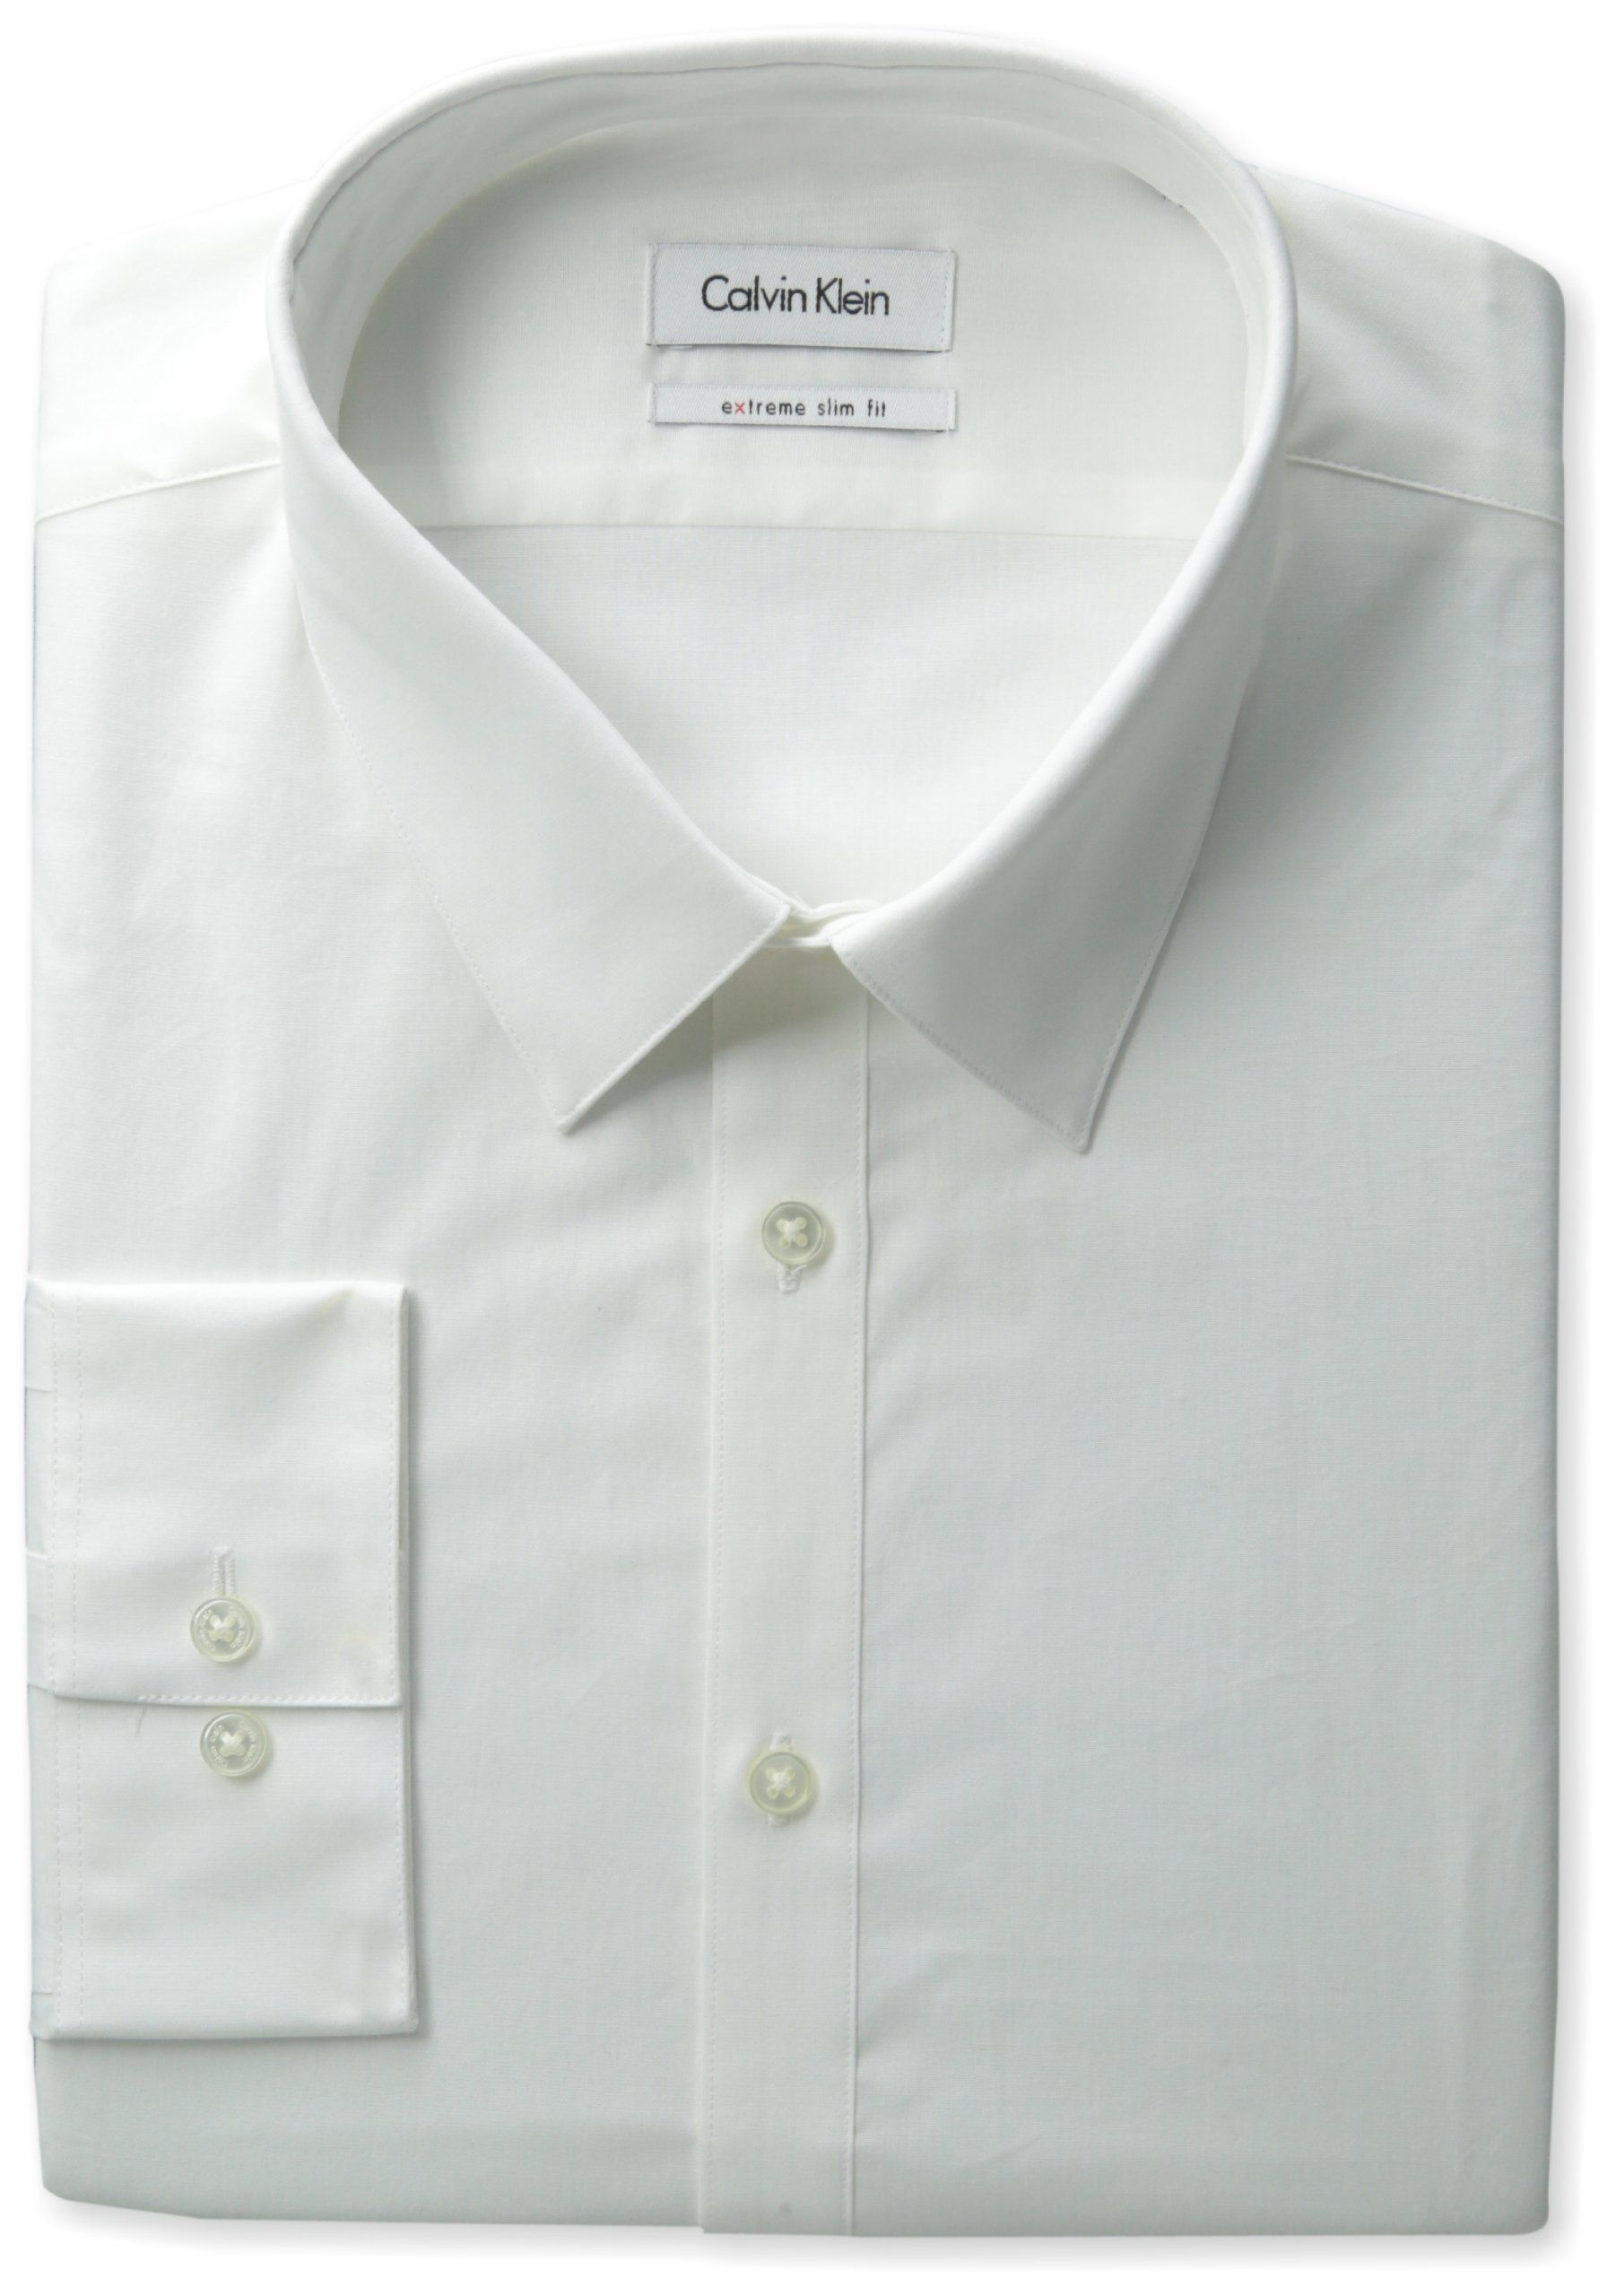 Calvin Klein Mens Extreme Slim Fit Dress Shirt White 15534 35